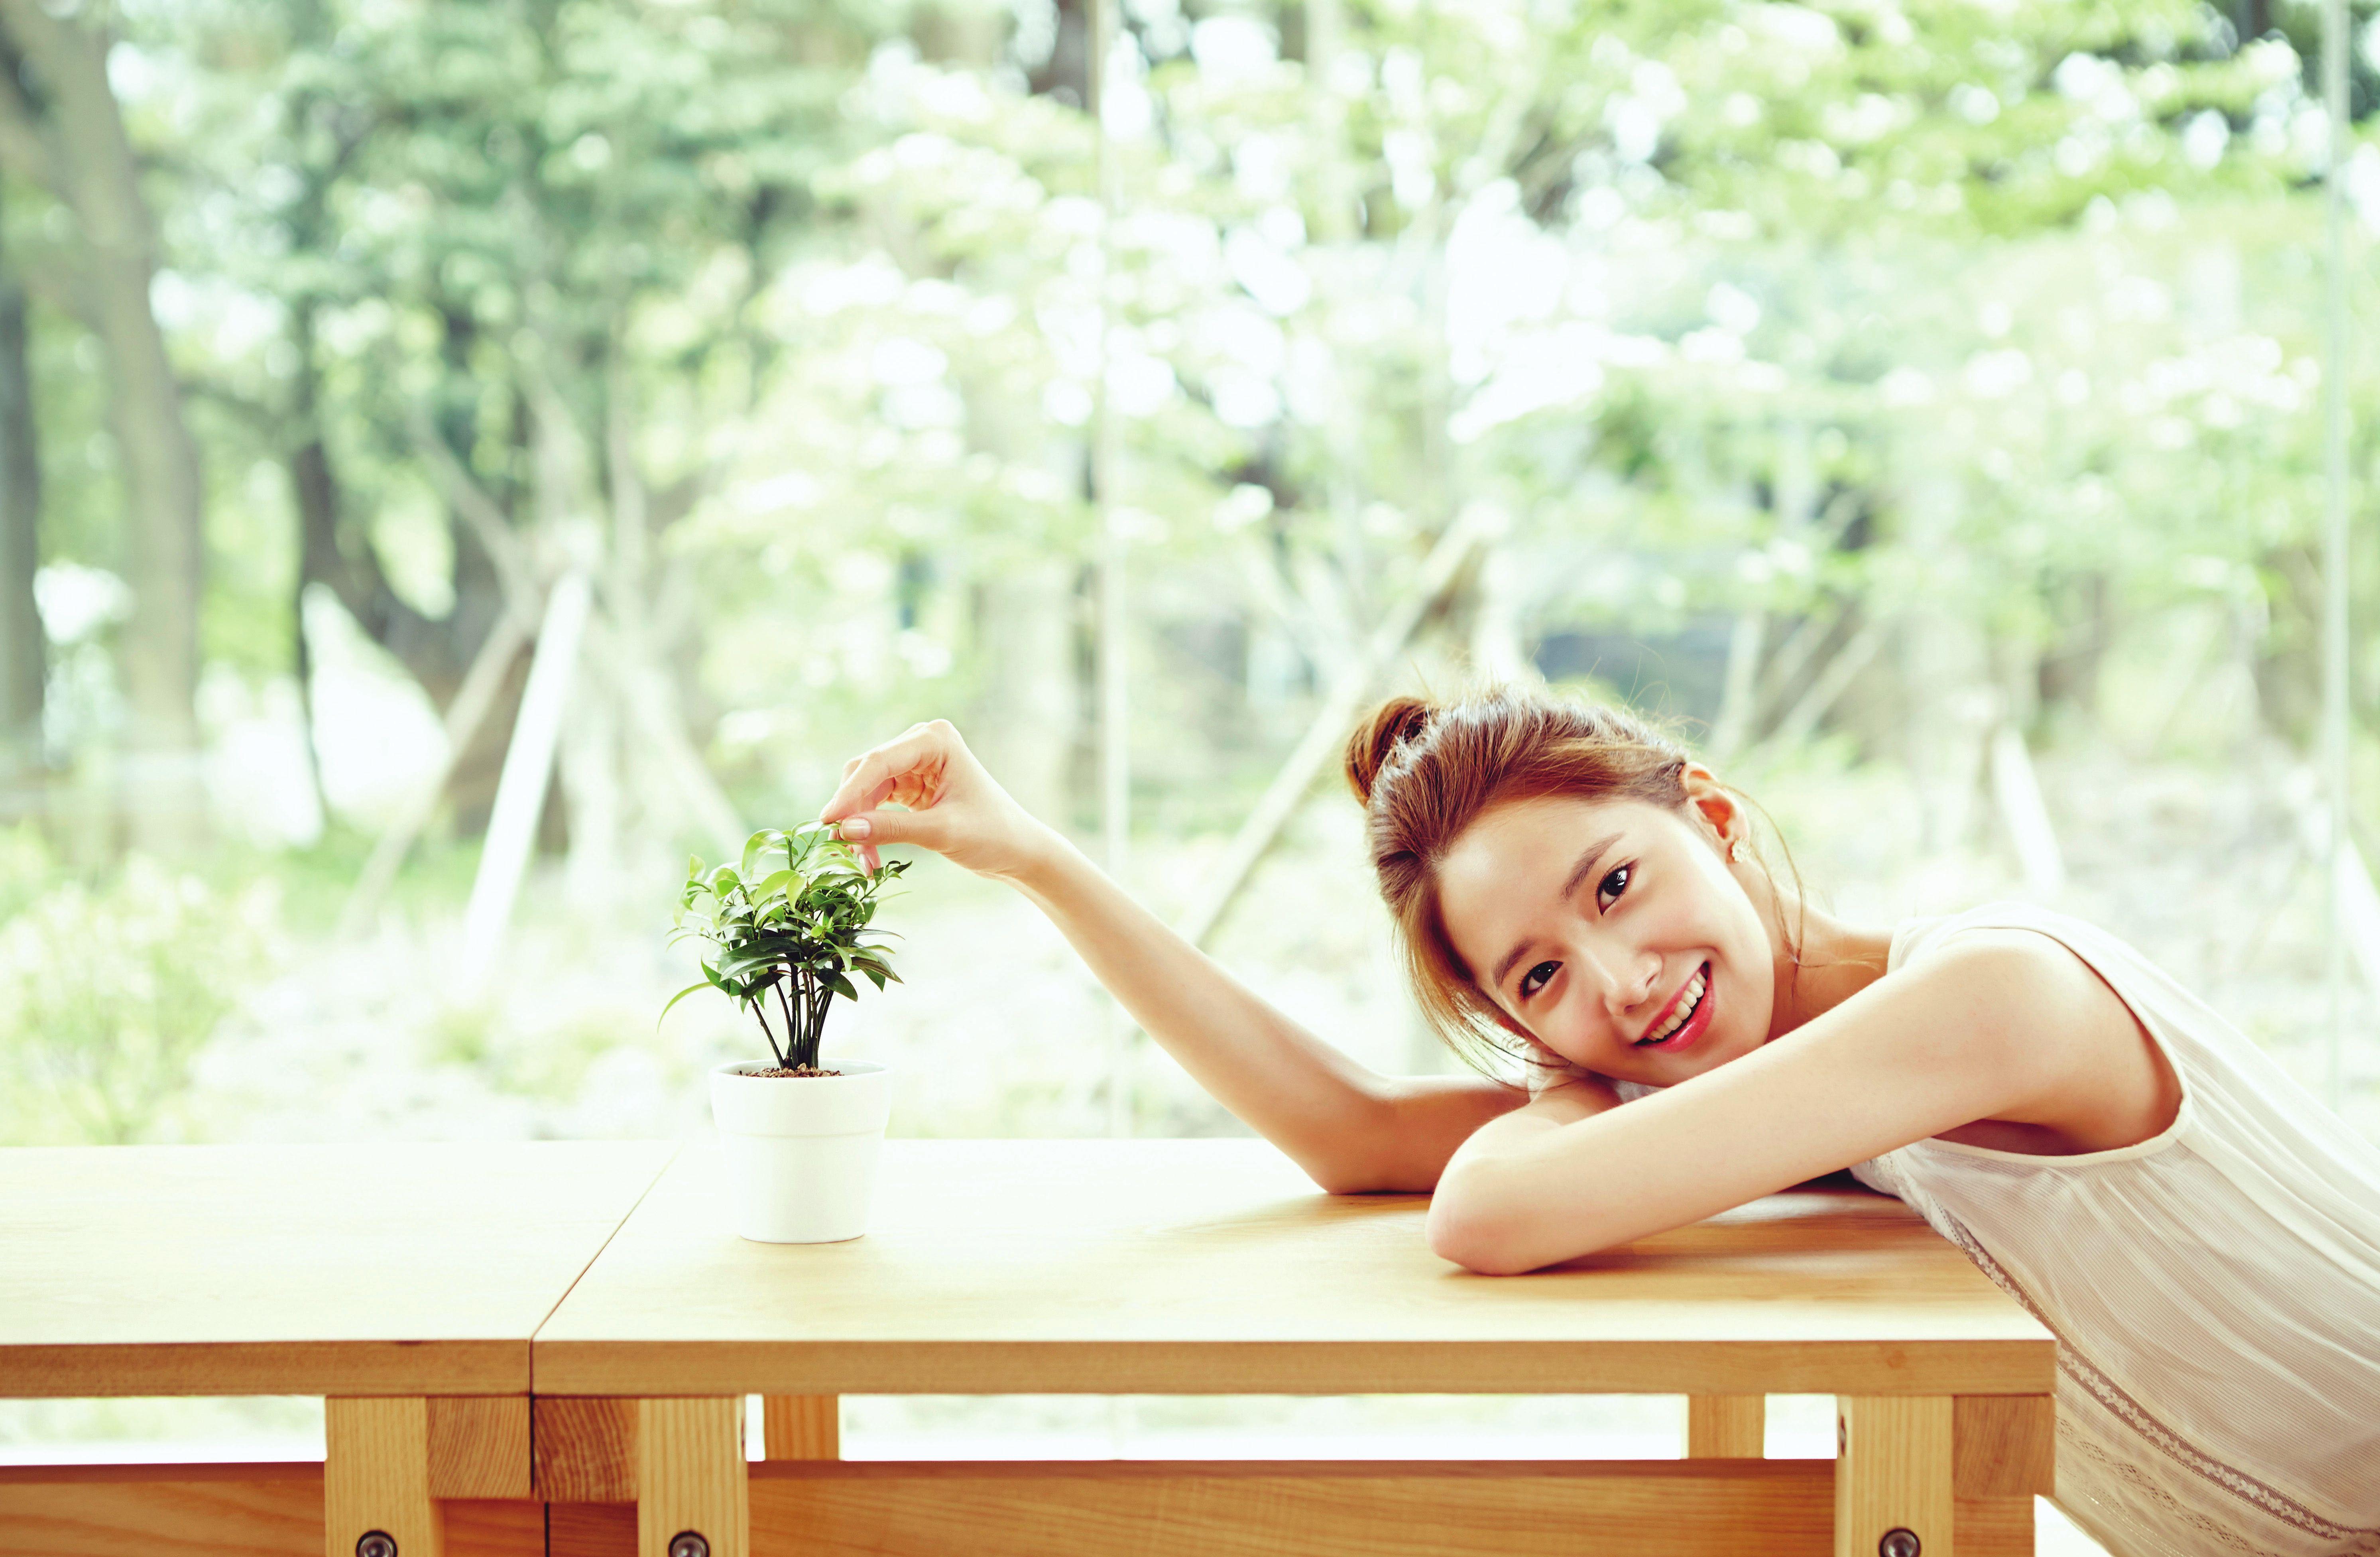 Yoona gets her goddess on for Innisfree SNSD Korean 5970x3905